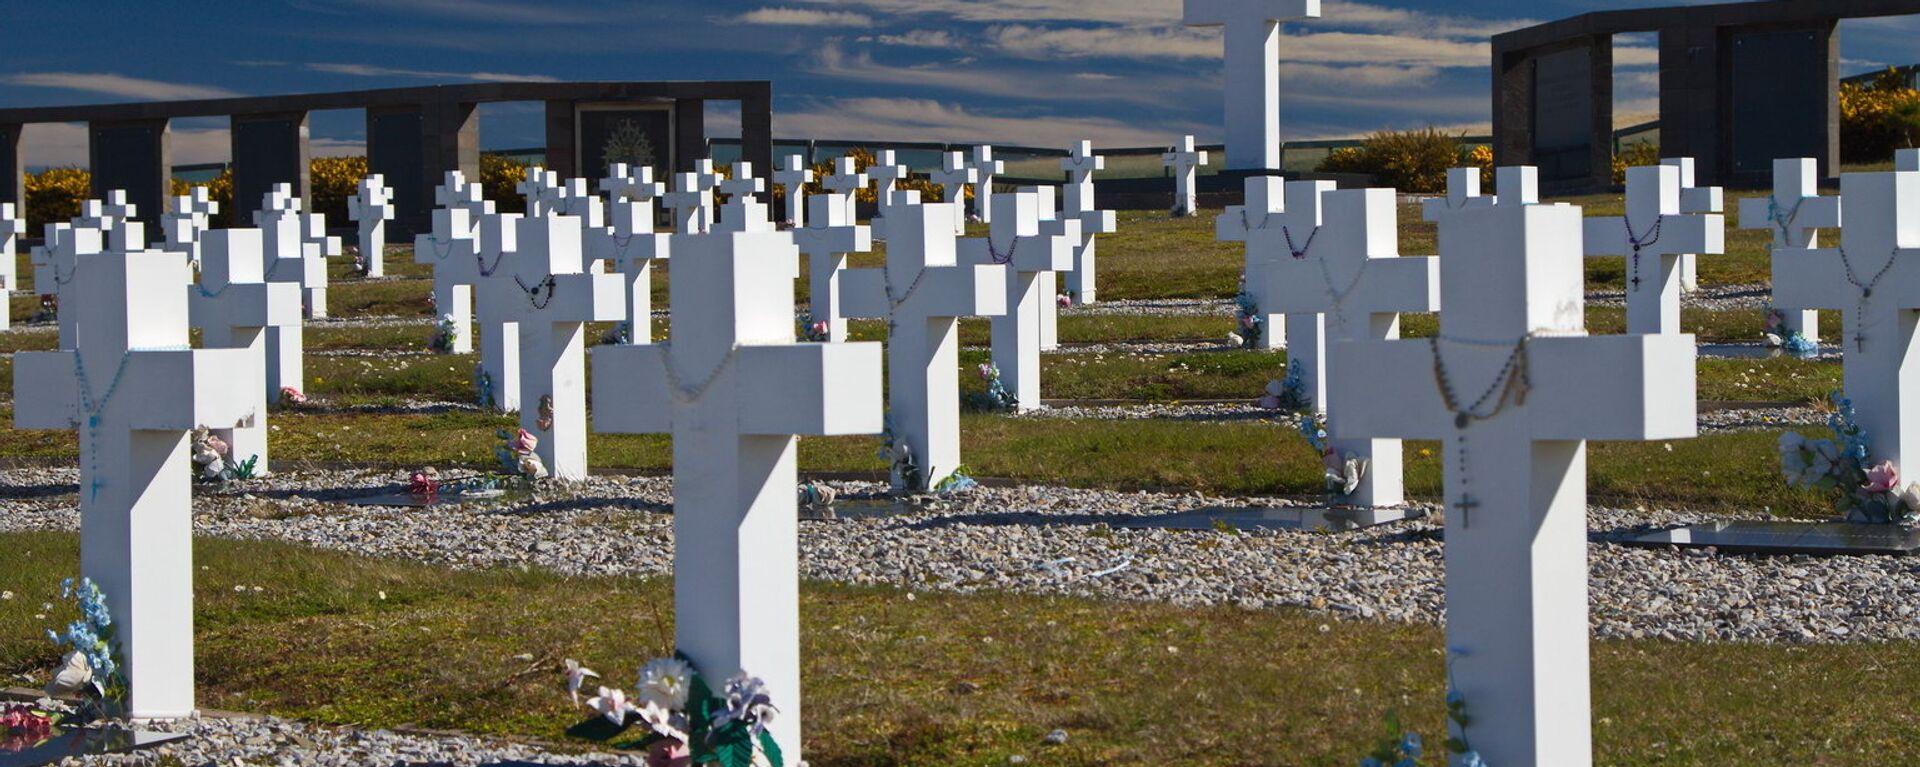 Cementerio de Darwin - Sputnik Mundo, 1920, 06.08.2021